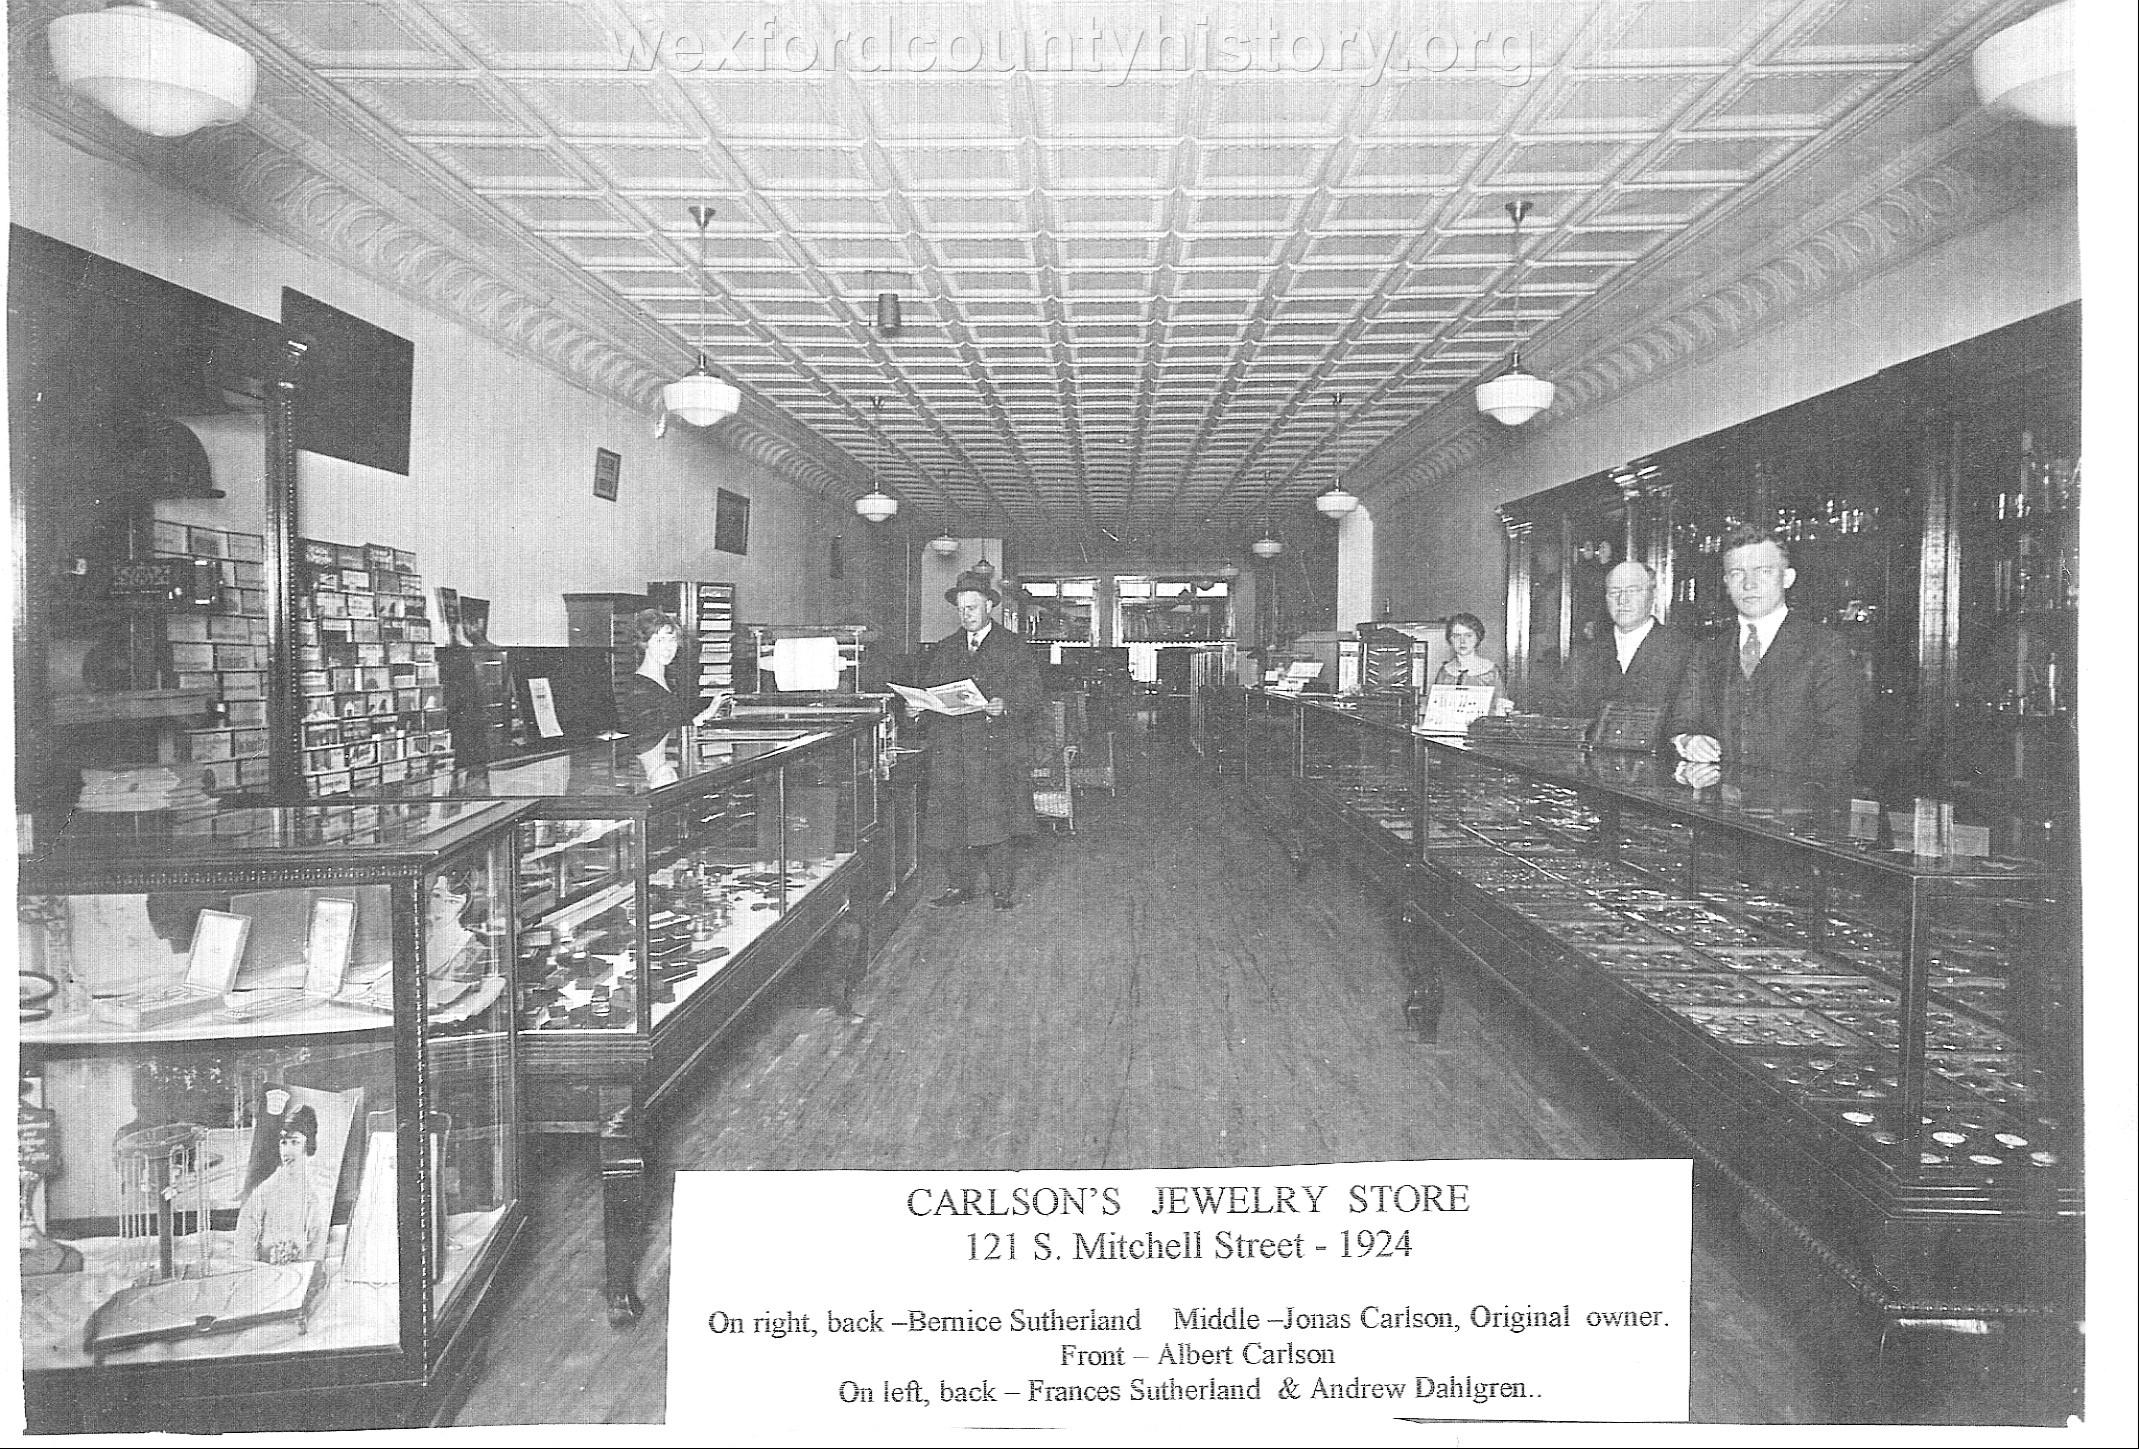 Carlson's Jewelry